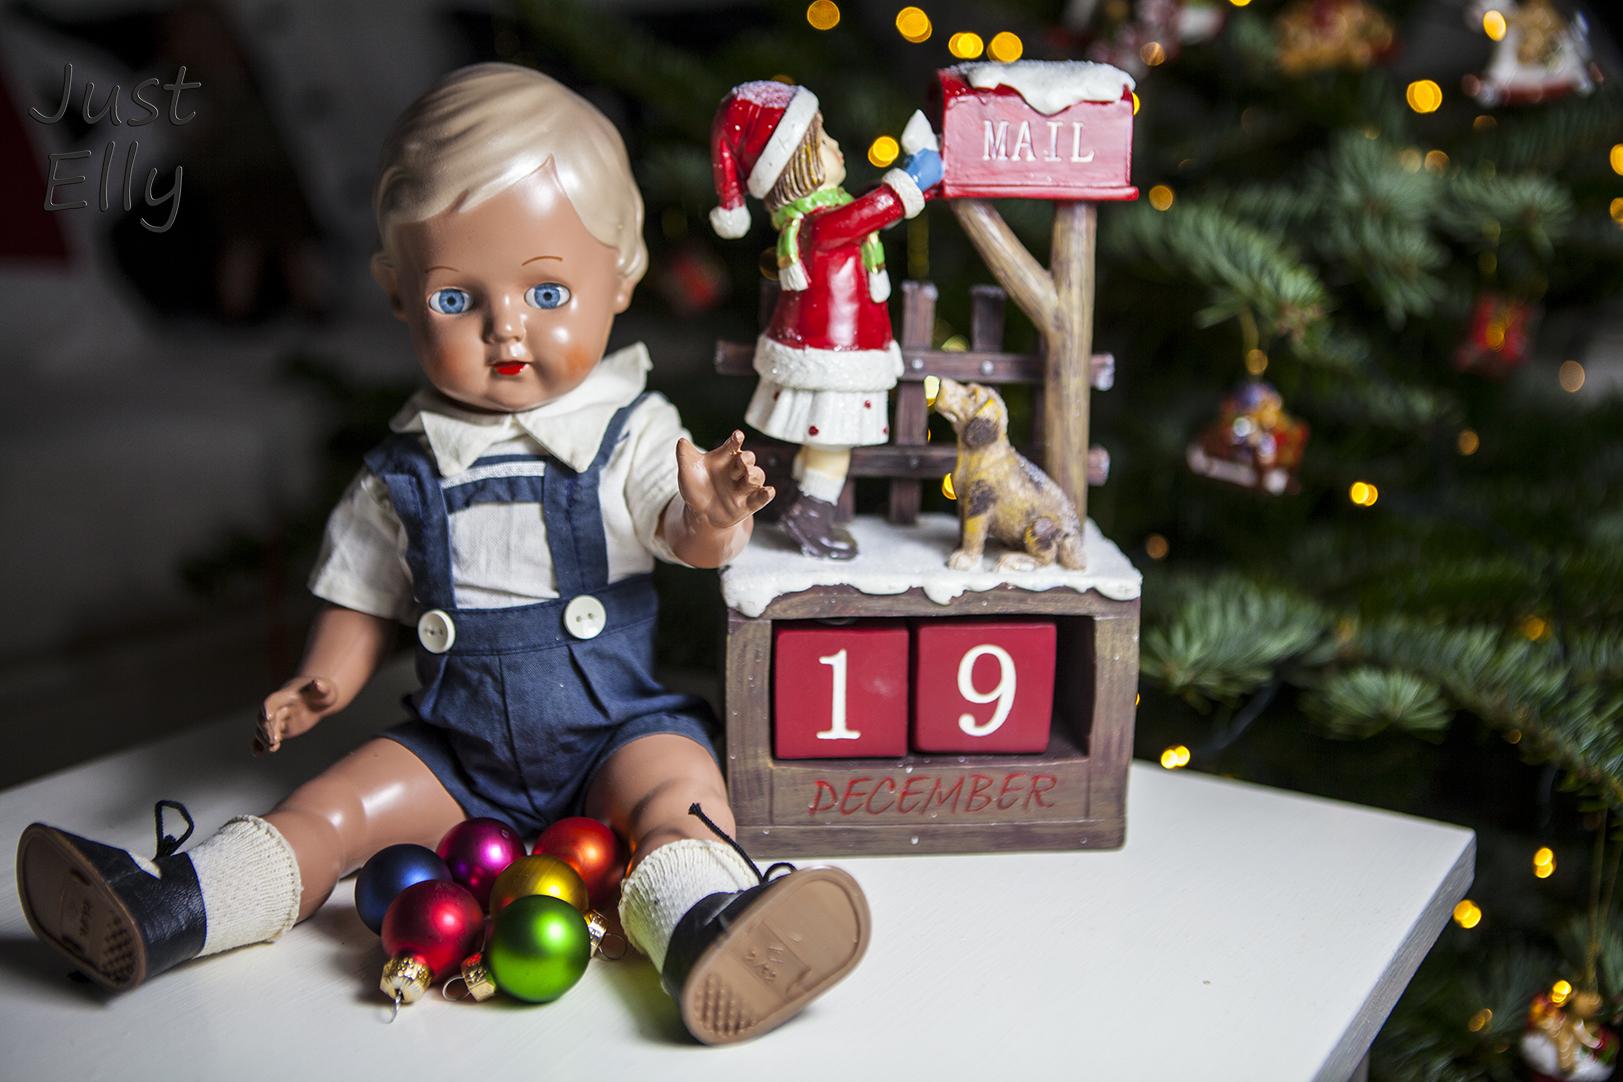 December 19th - My advent calendar